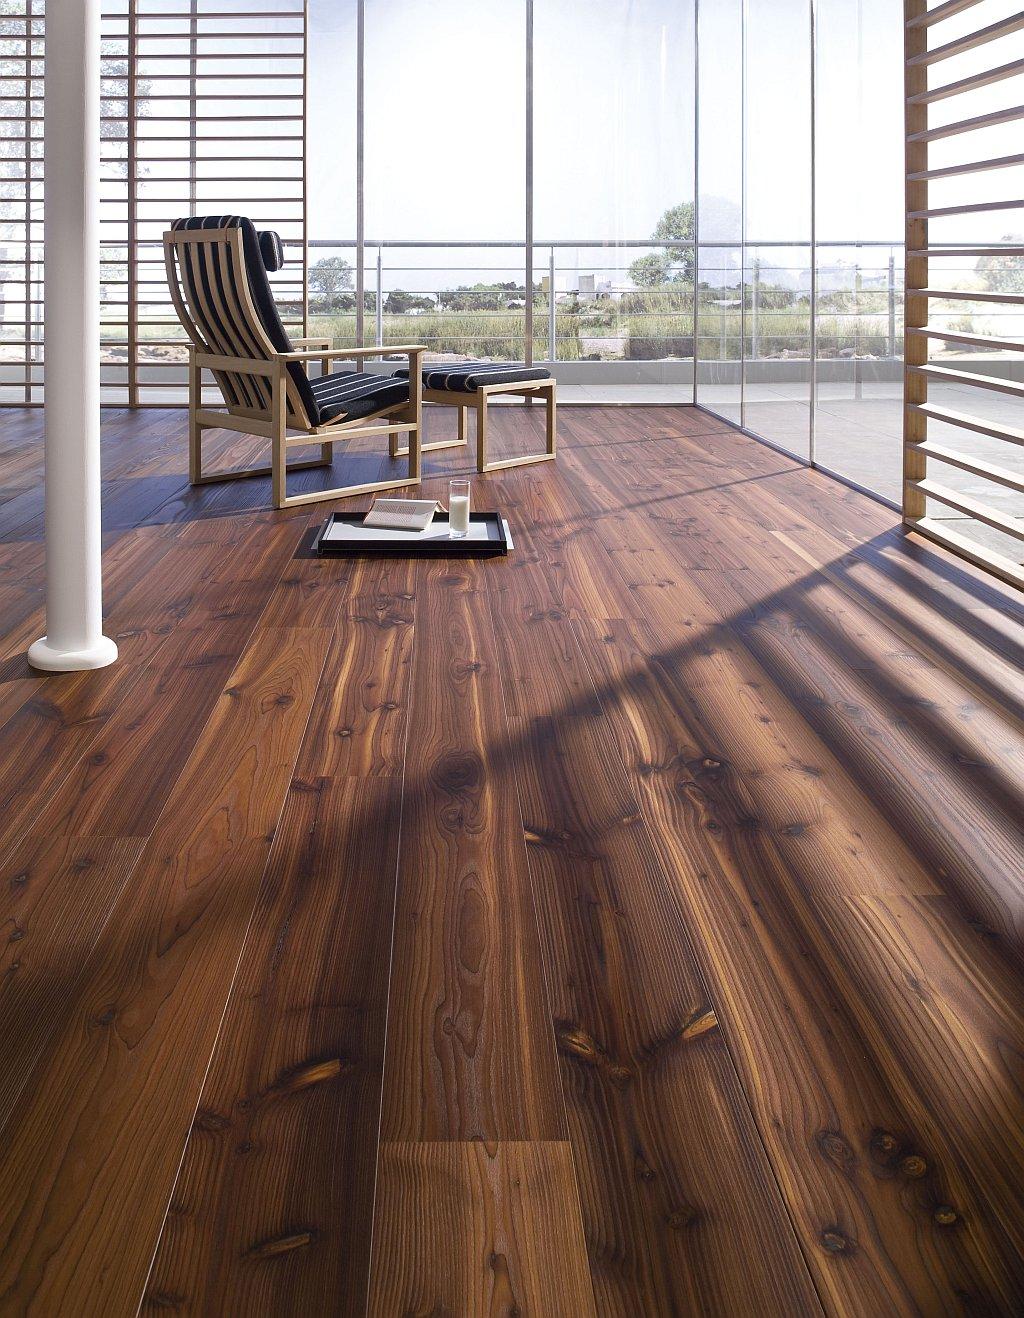 contemporary laminate wooden floors wood floor. wood floor HQFCWXK